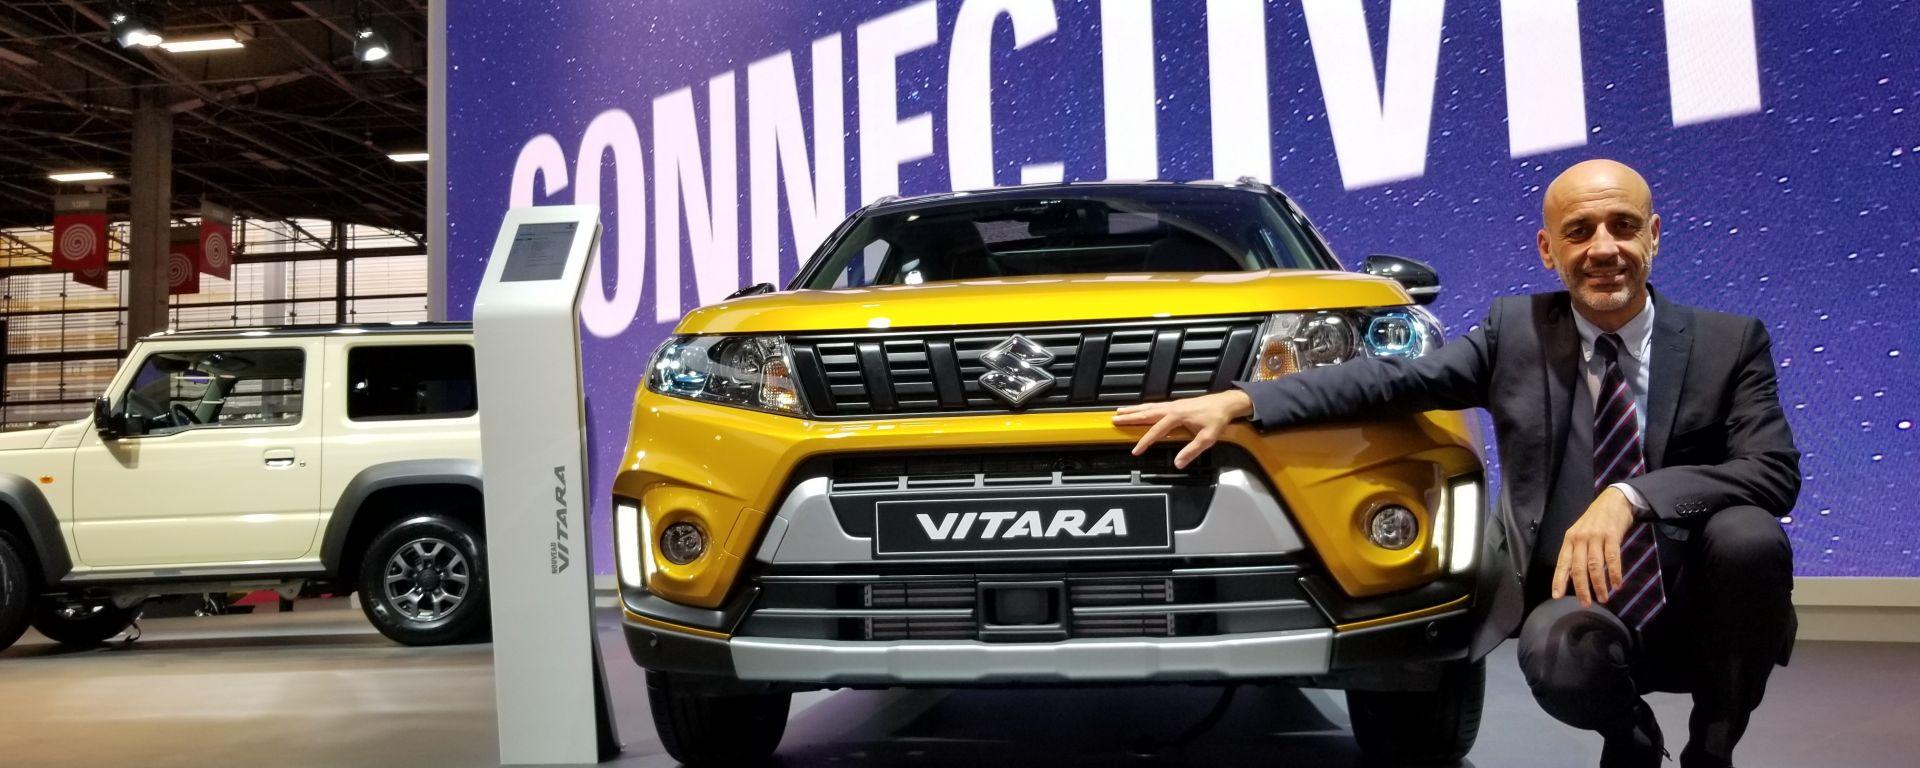 Novità Suzuki a Parigi 2018: intervista a Massimo Nalli